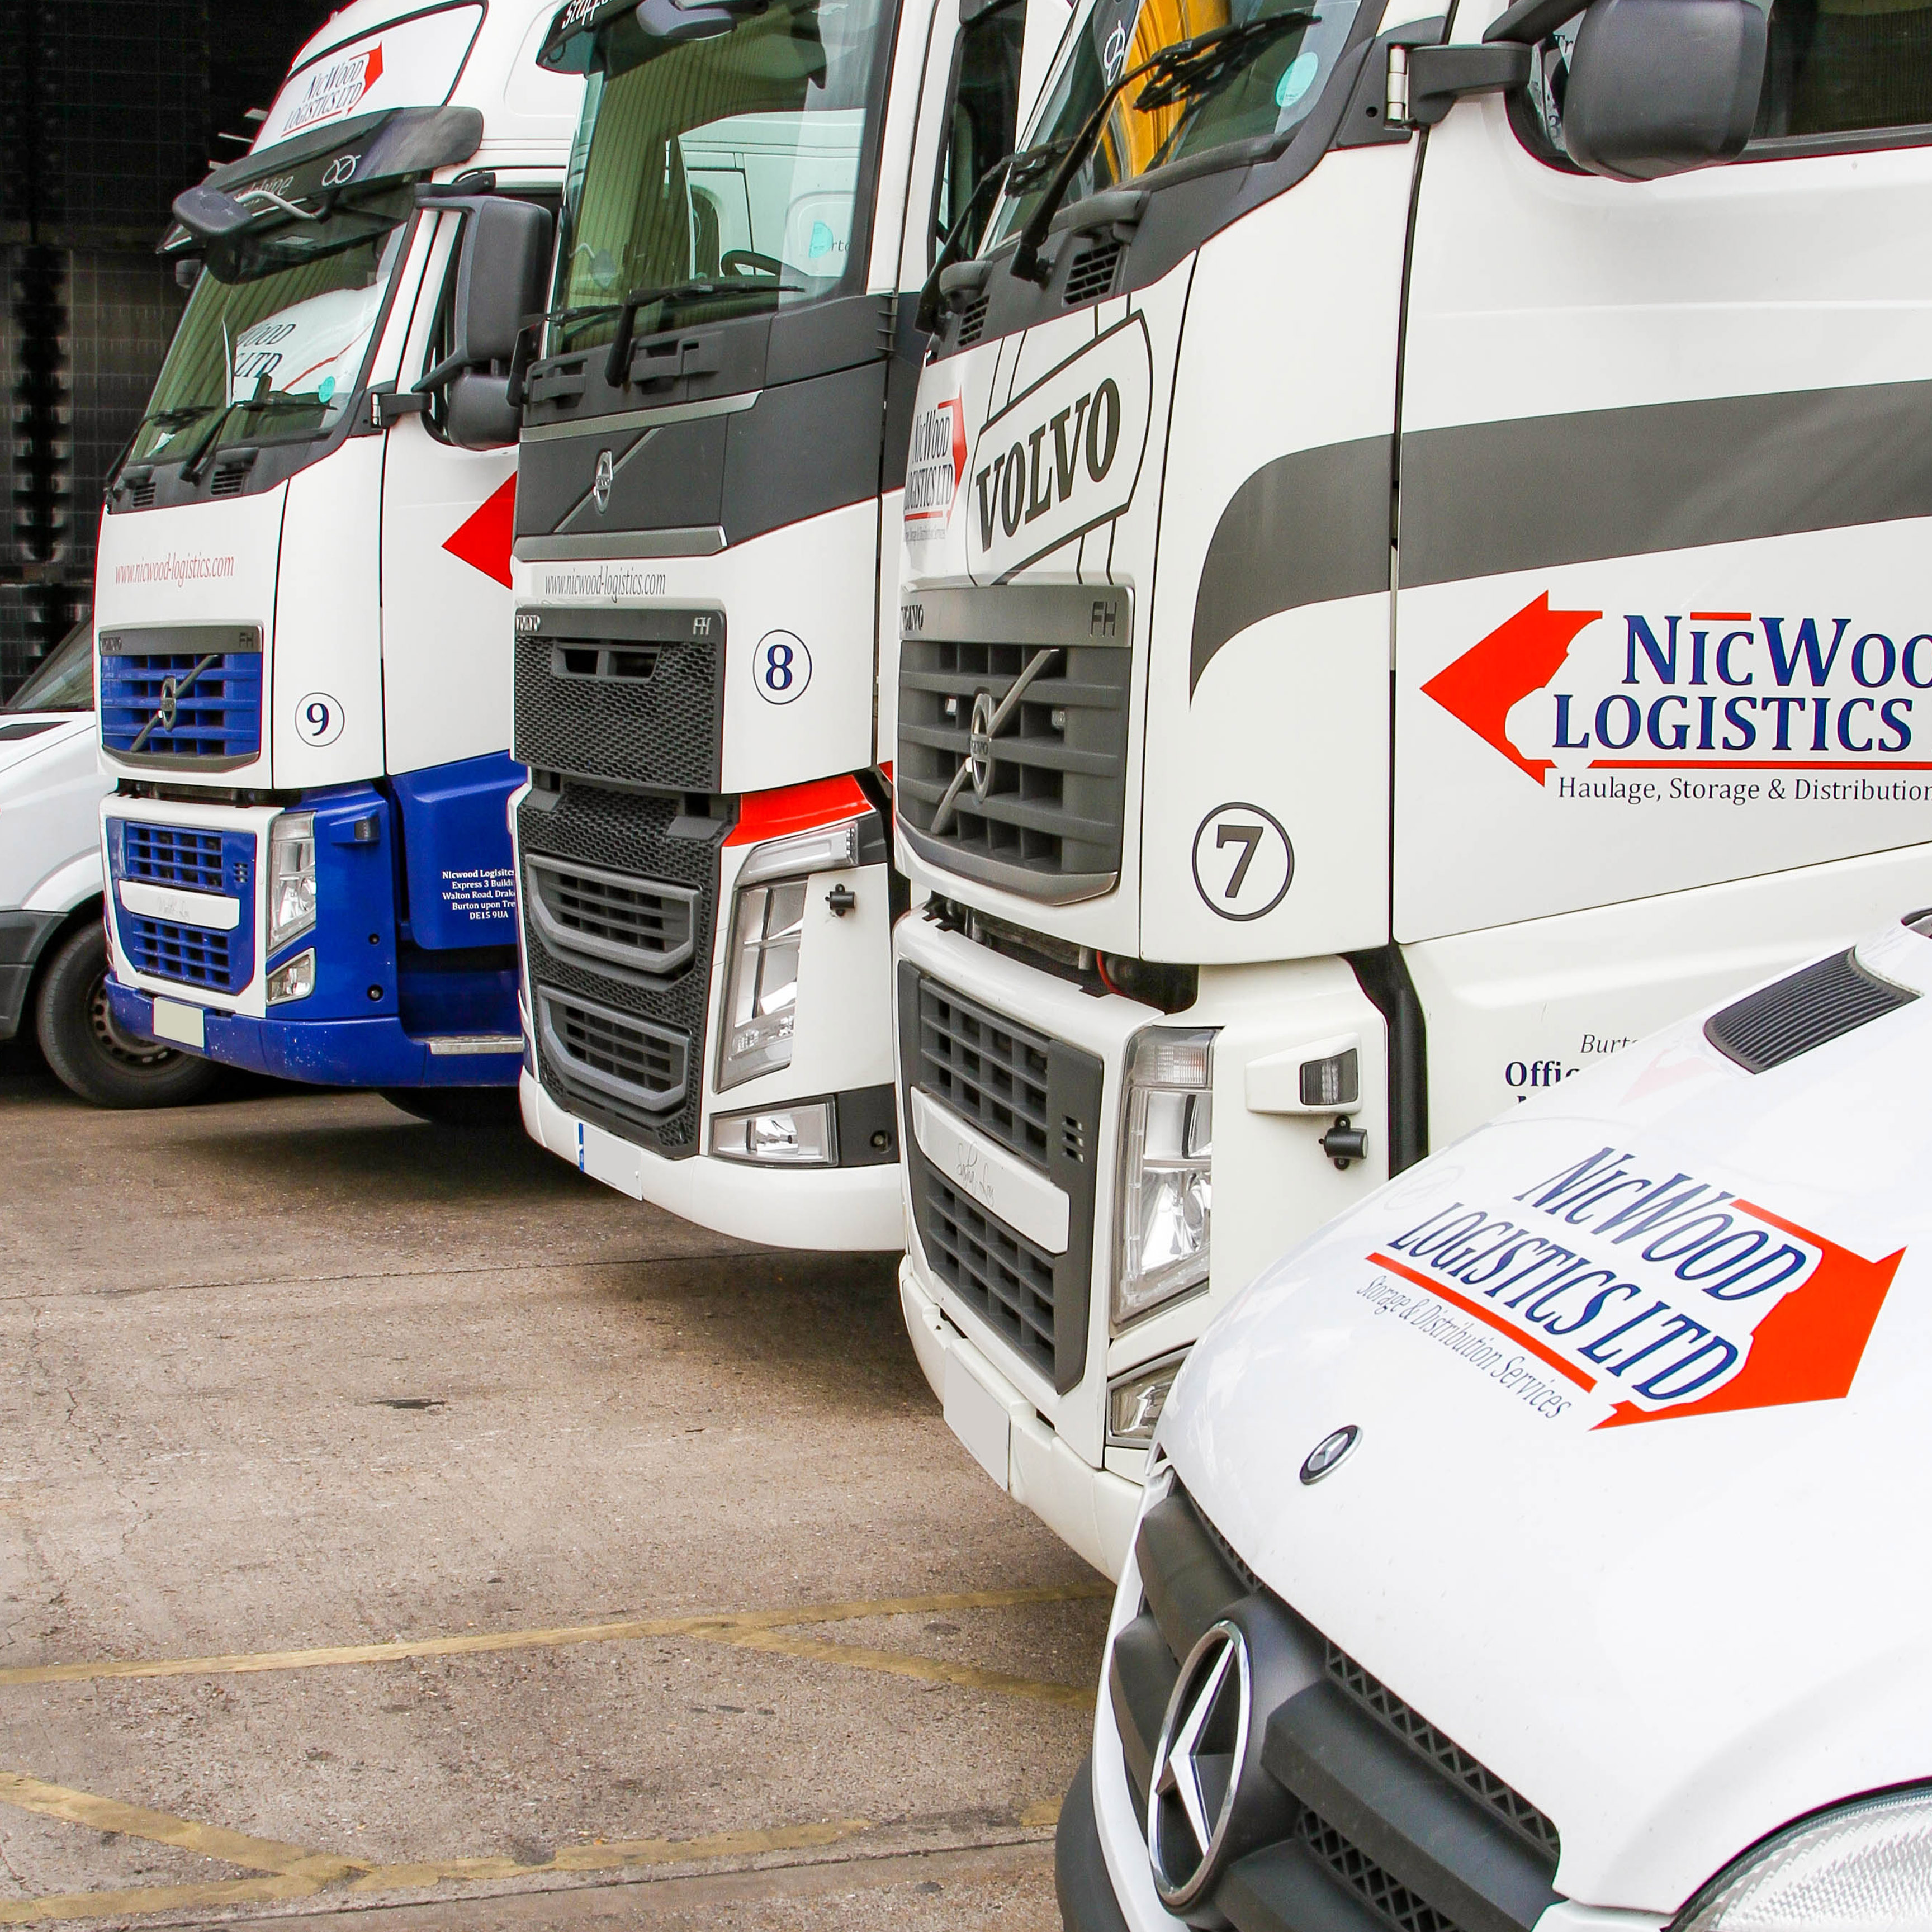 LorrySquare